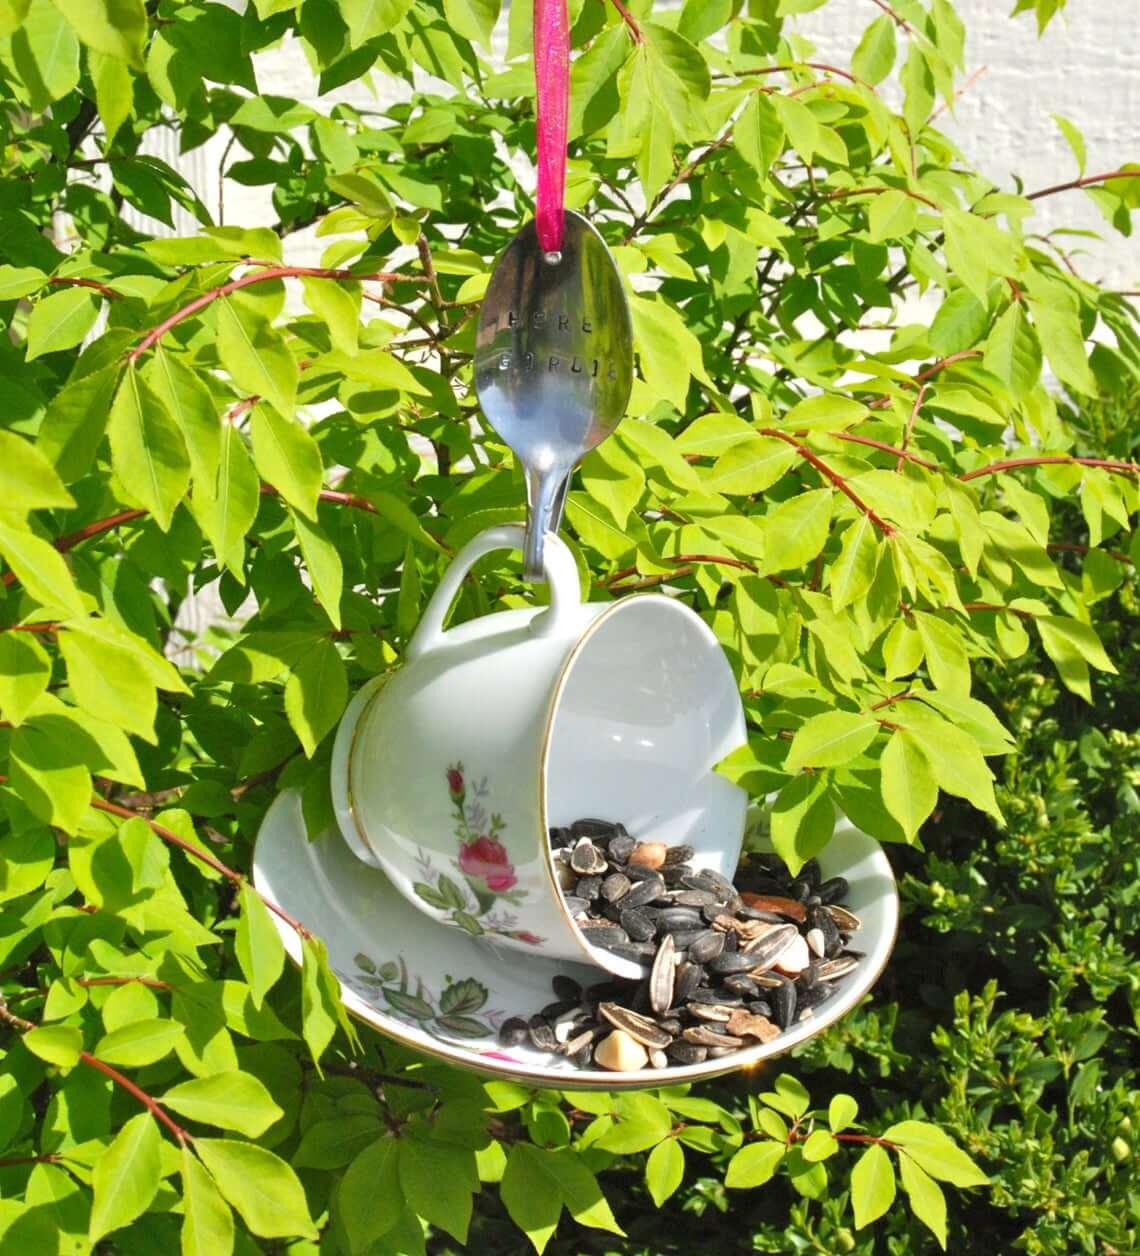 Teacup, Saucer, and Bent Spoon Bird Feeder